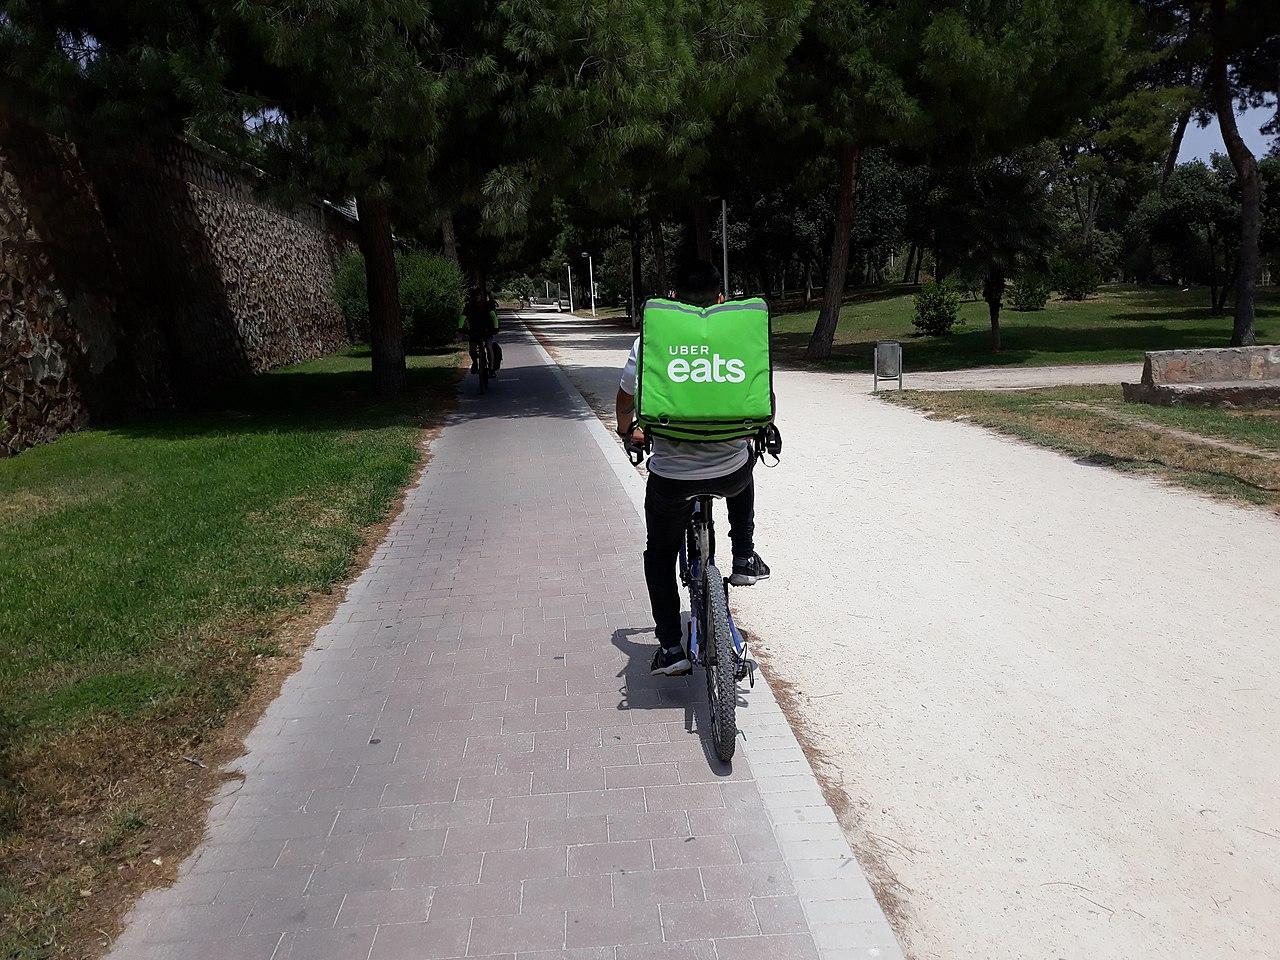 2019 06 25 Carril bici al Jardí del Túria 05.jpg